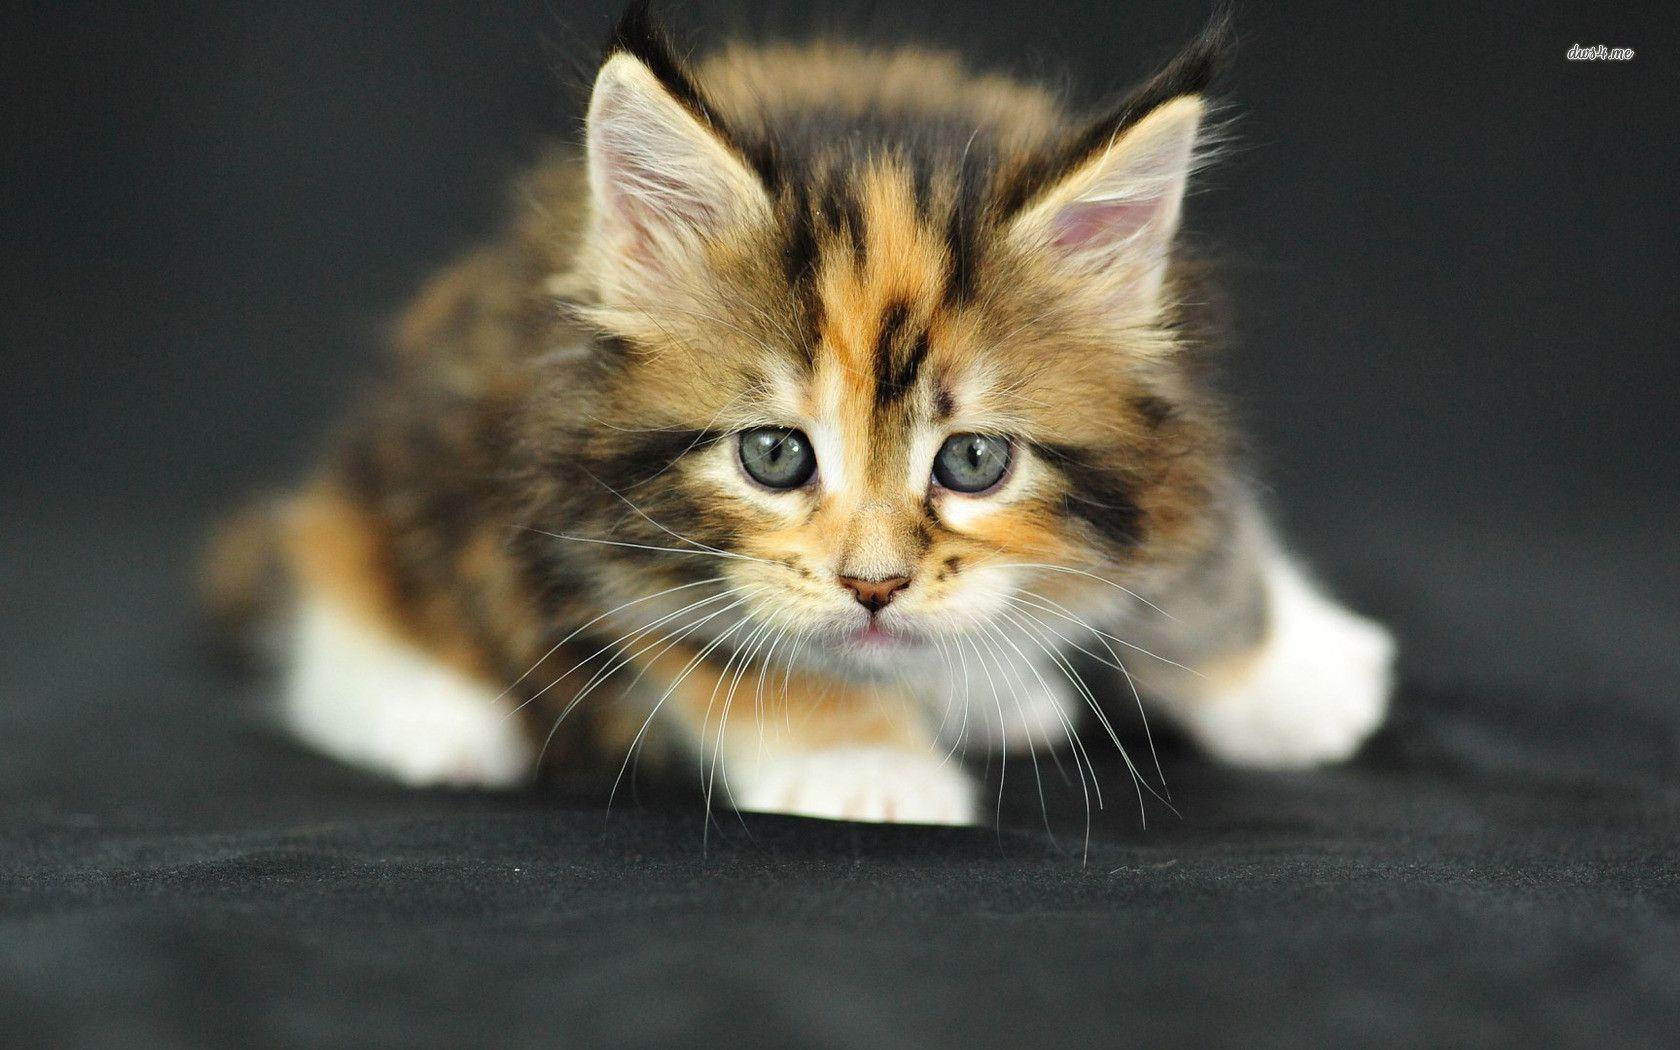 Cute Kitten wallpaper - Animal wallpapers - #